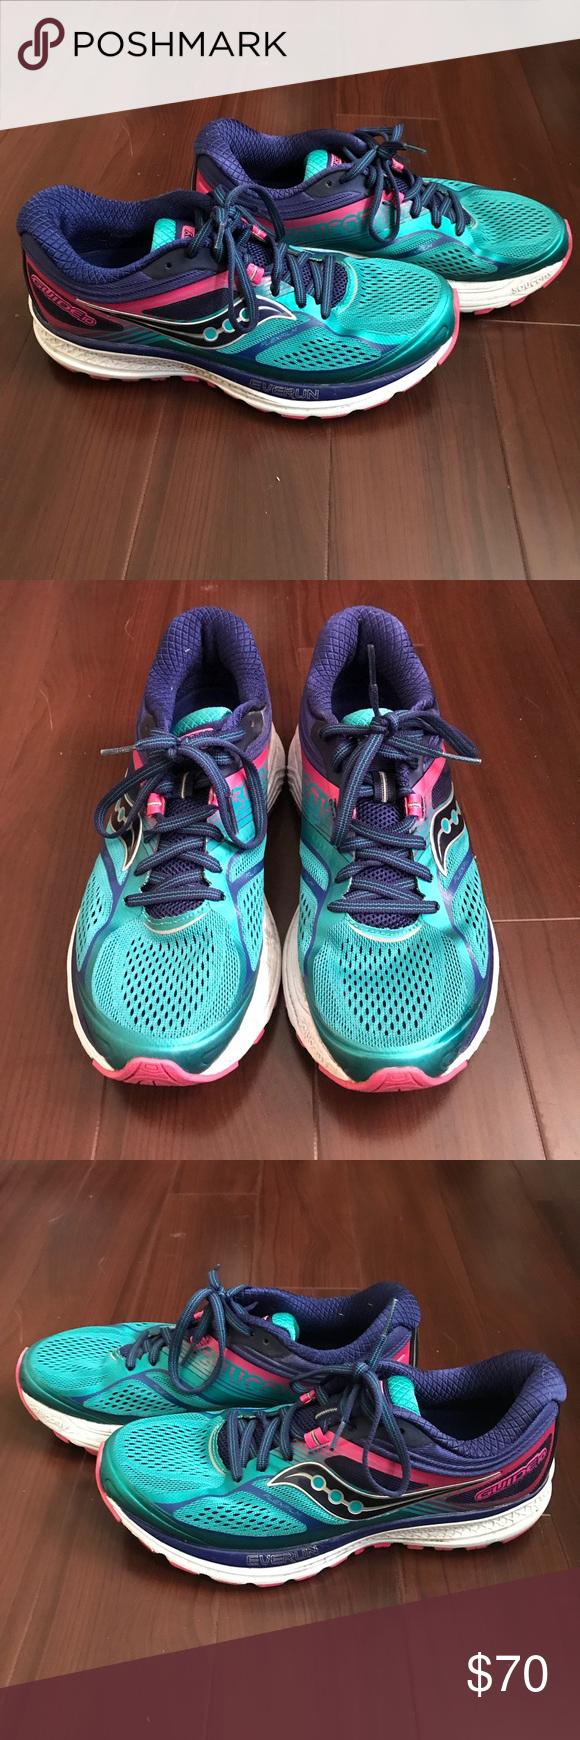 Womens Running Shoe Size 8.5